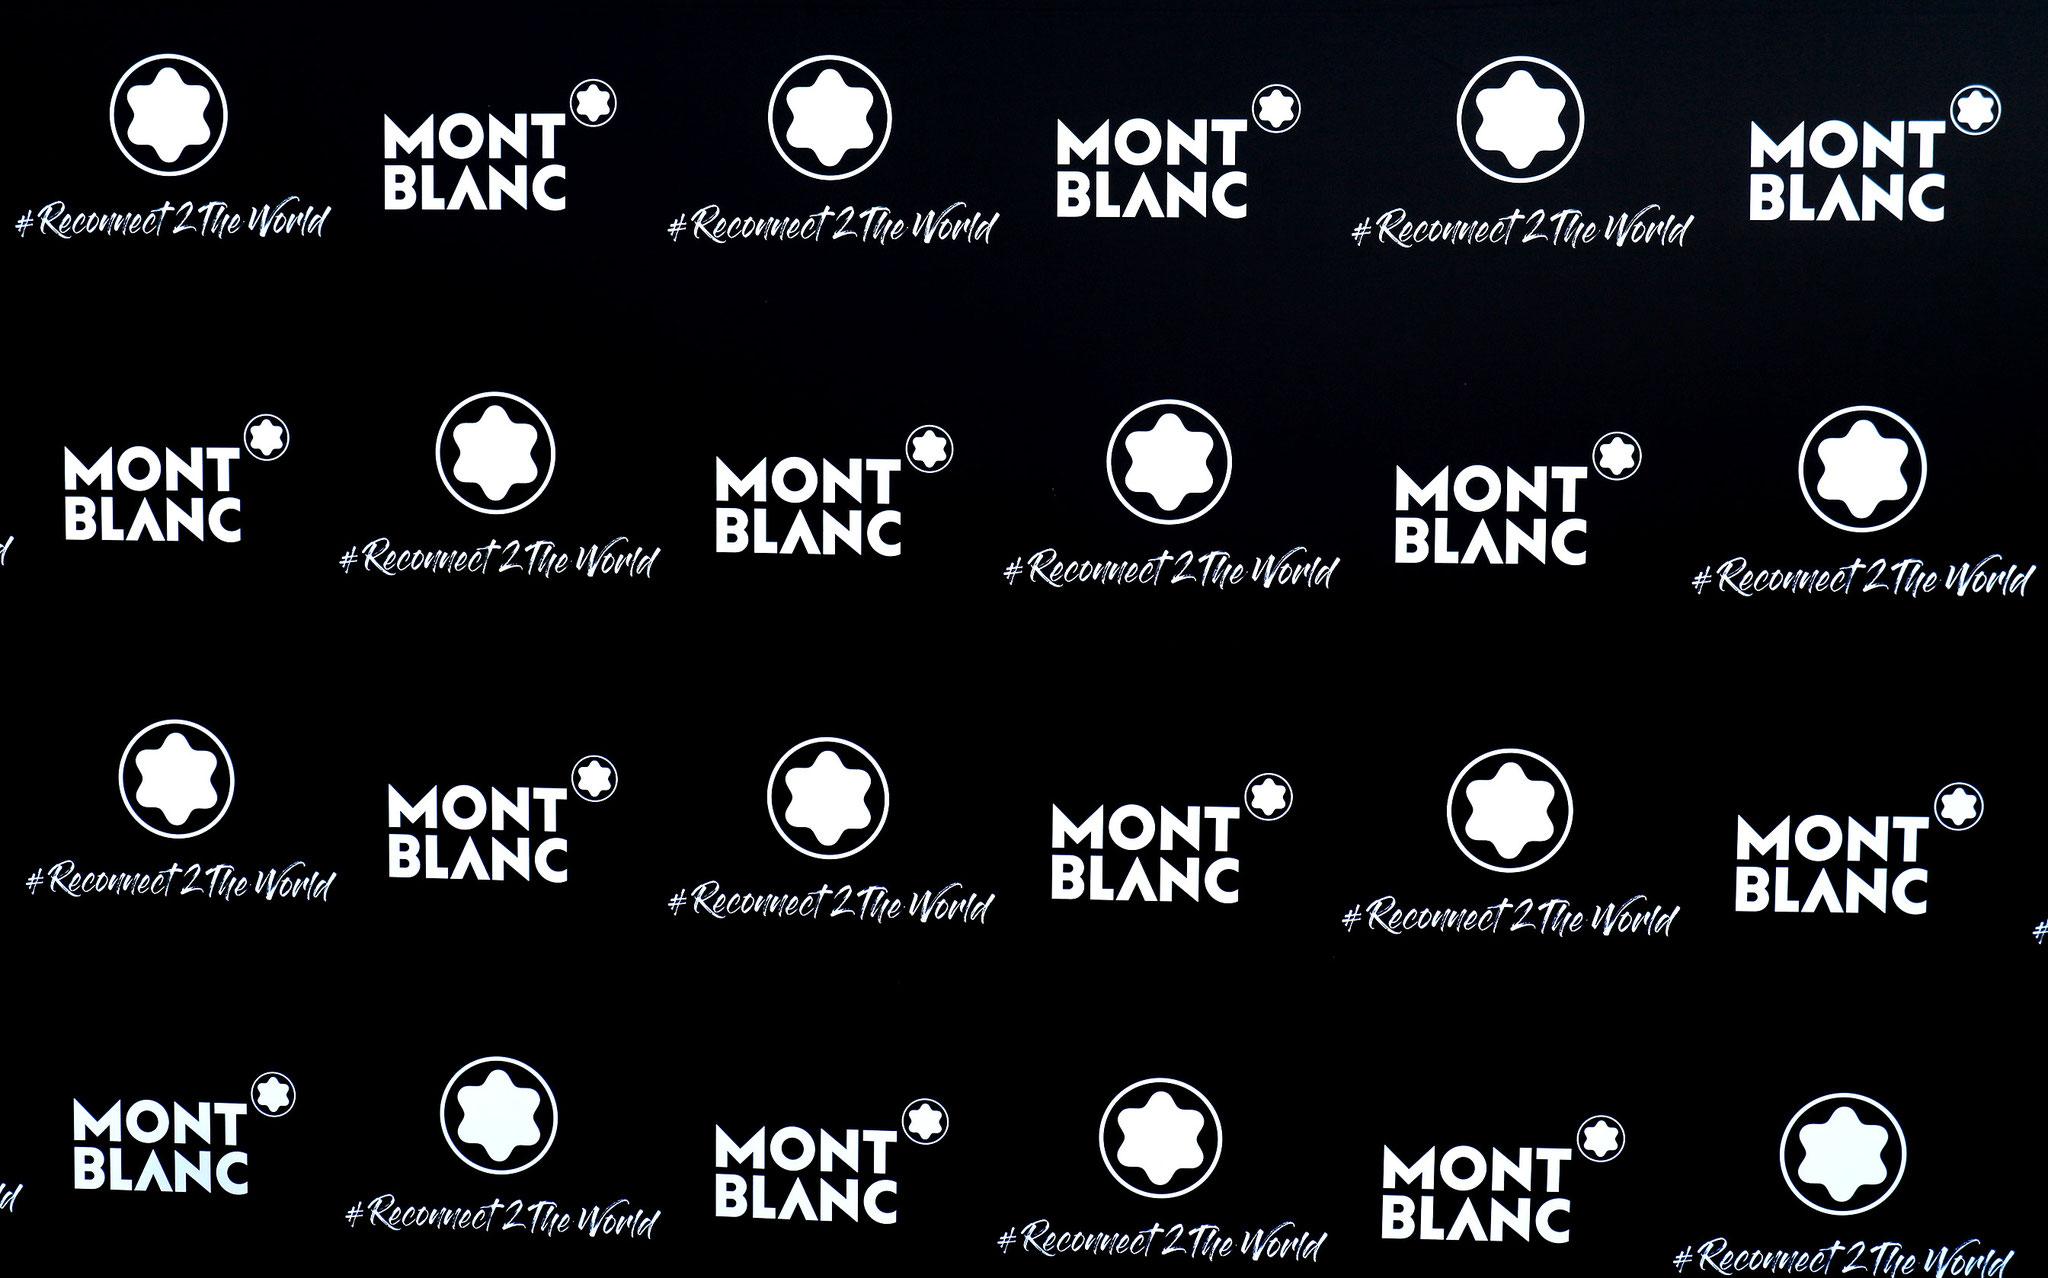 MARC JUNG X MONTBLANC // 2019, Berlin